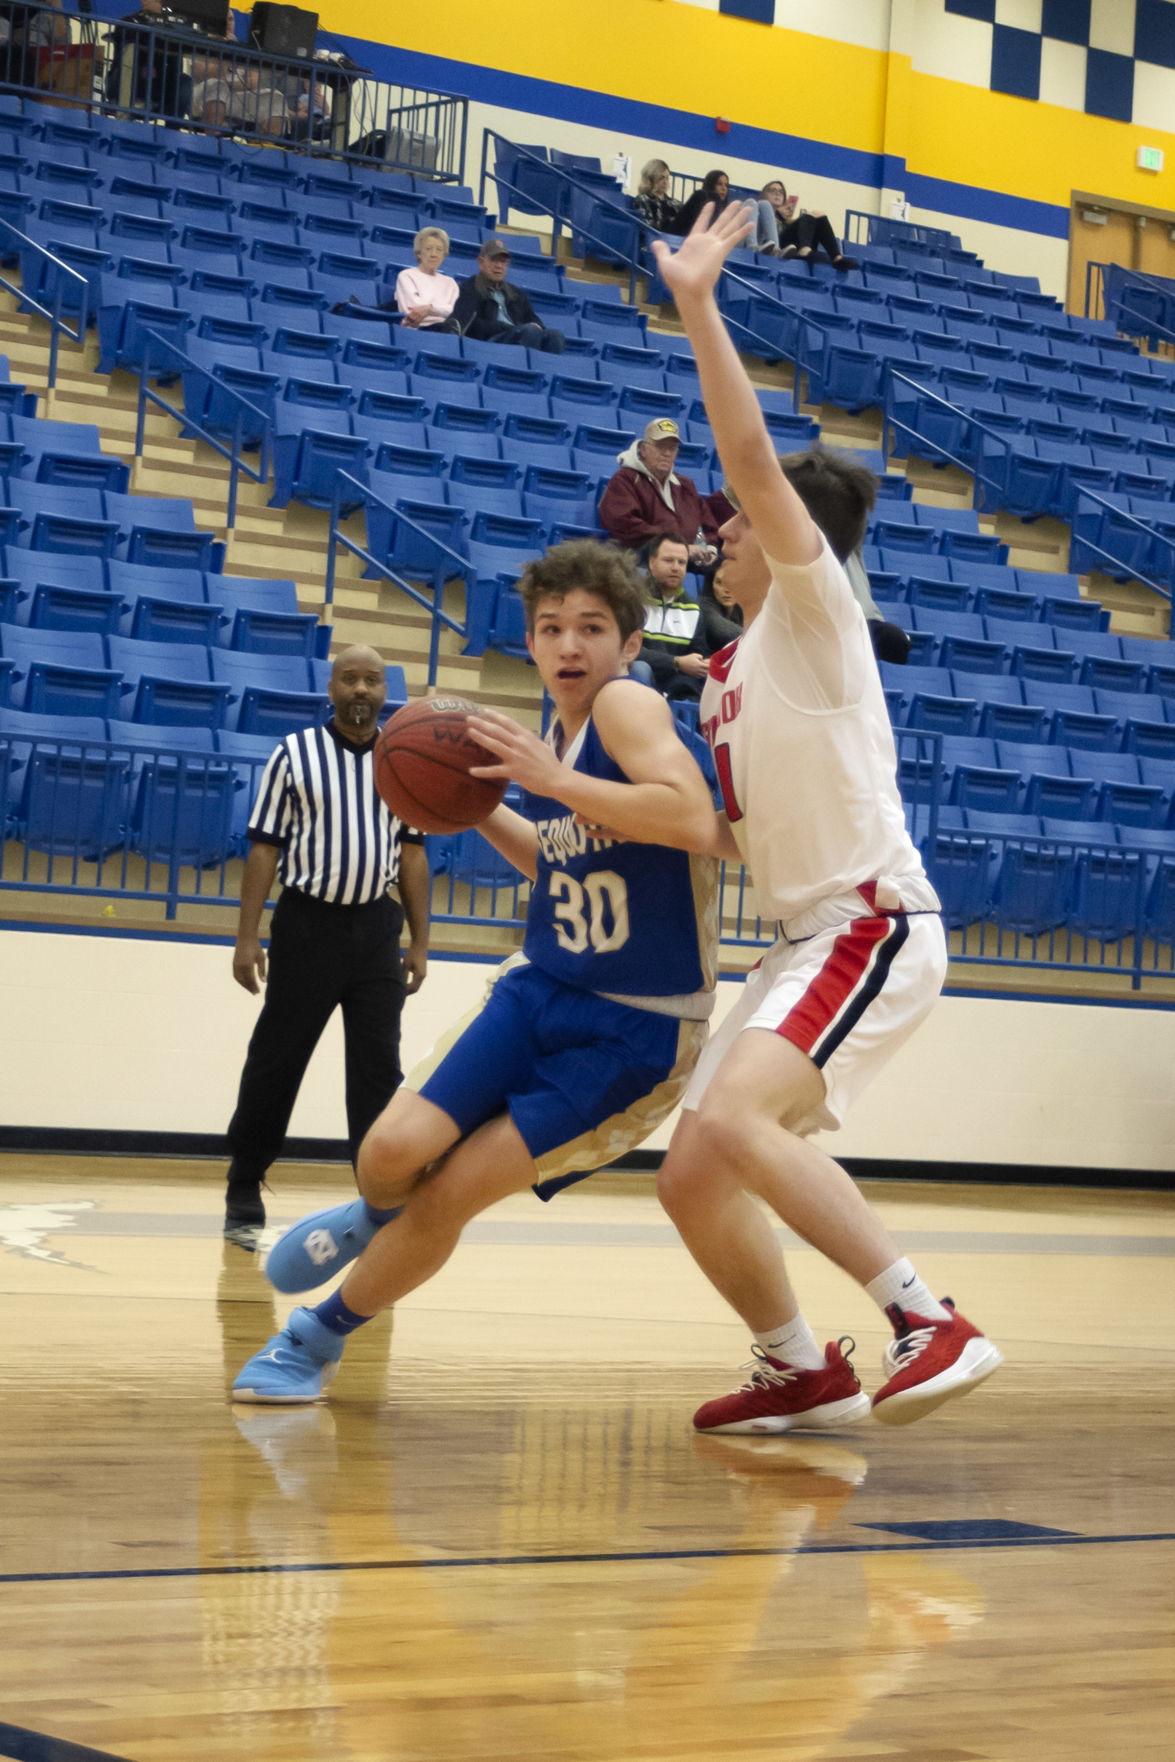 20190125 Sequoyah vs. Skiatook Basketball